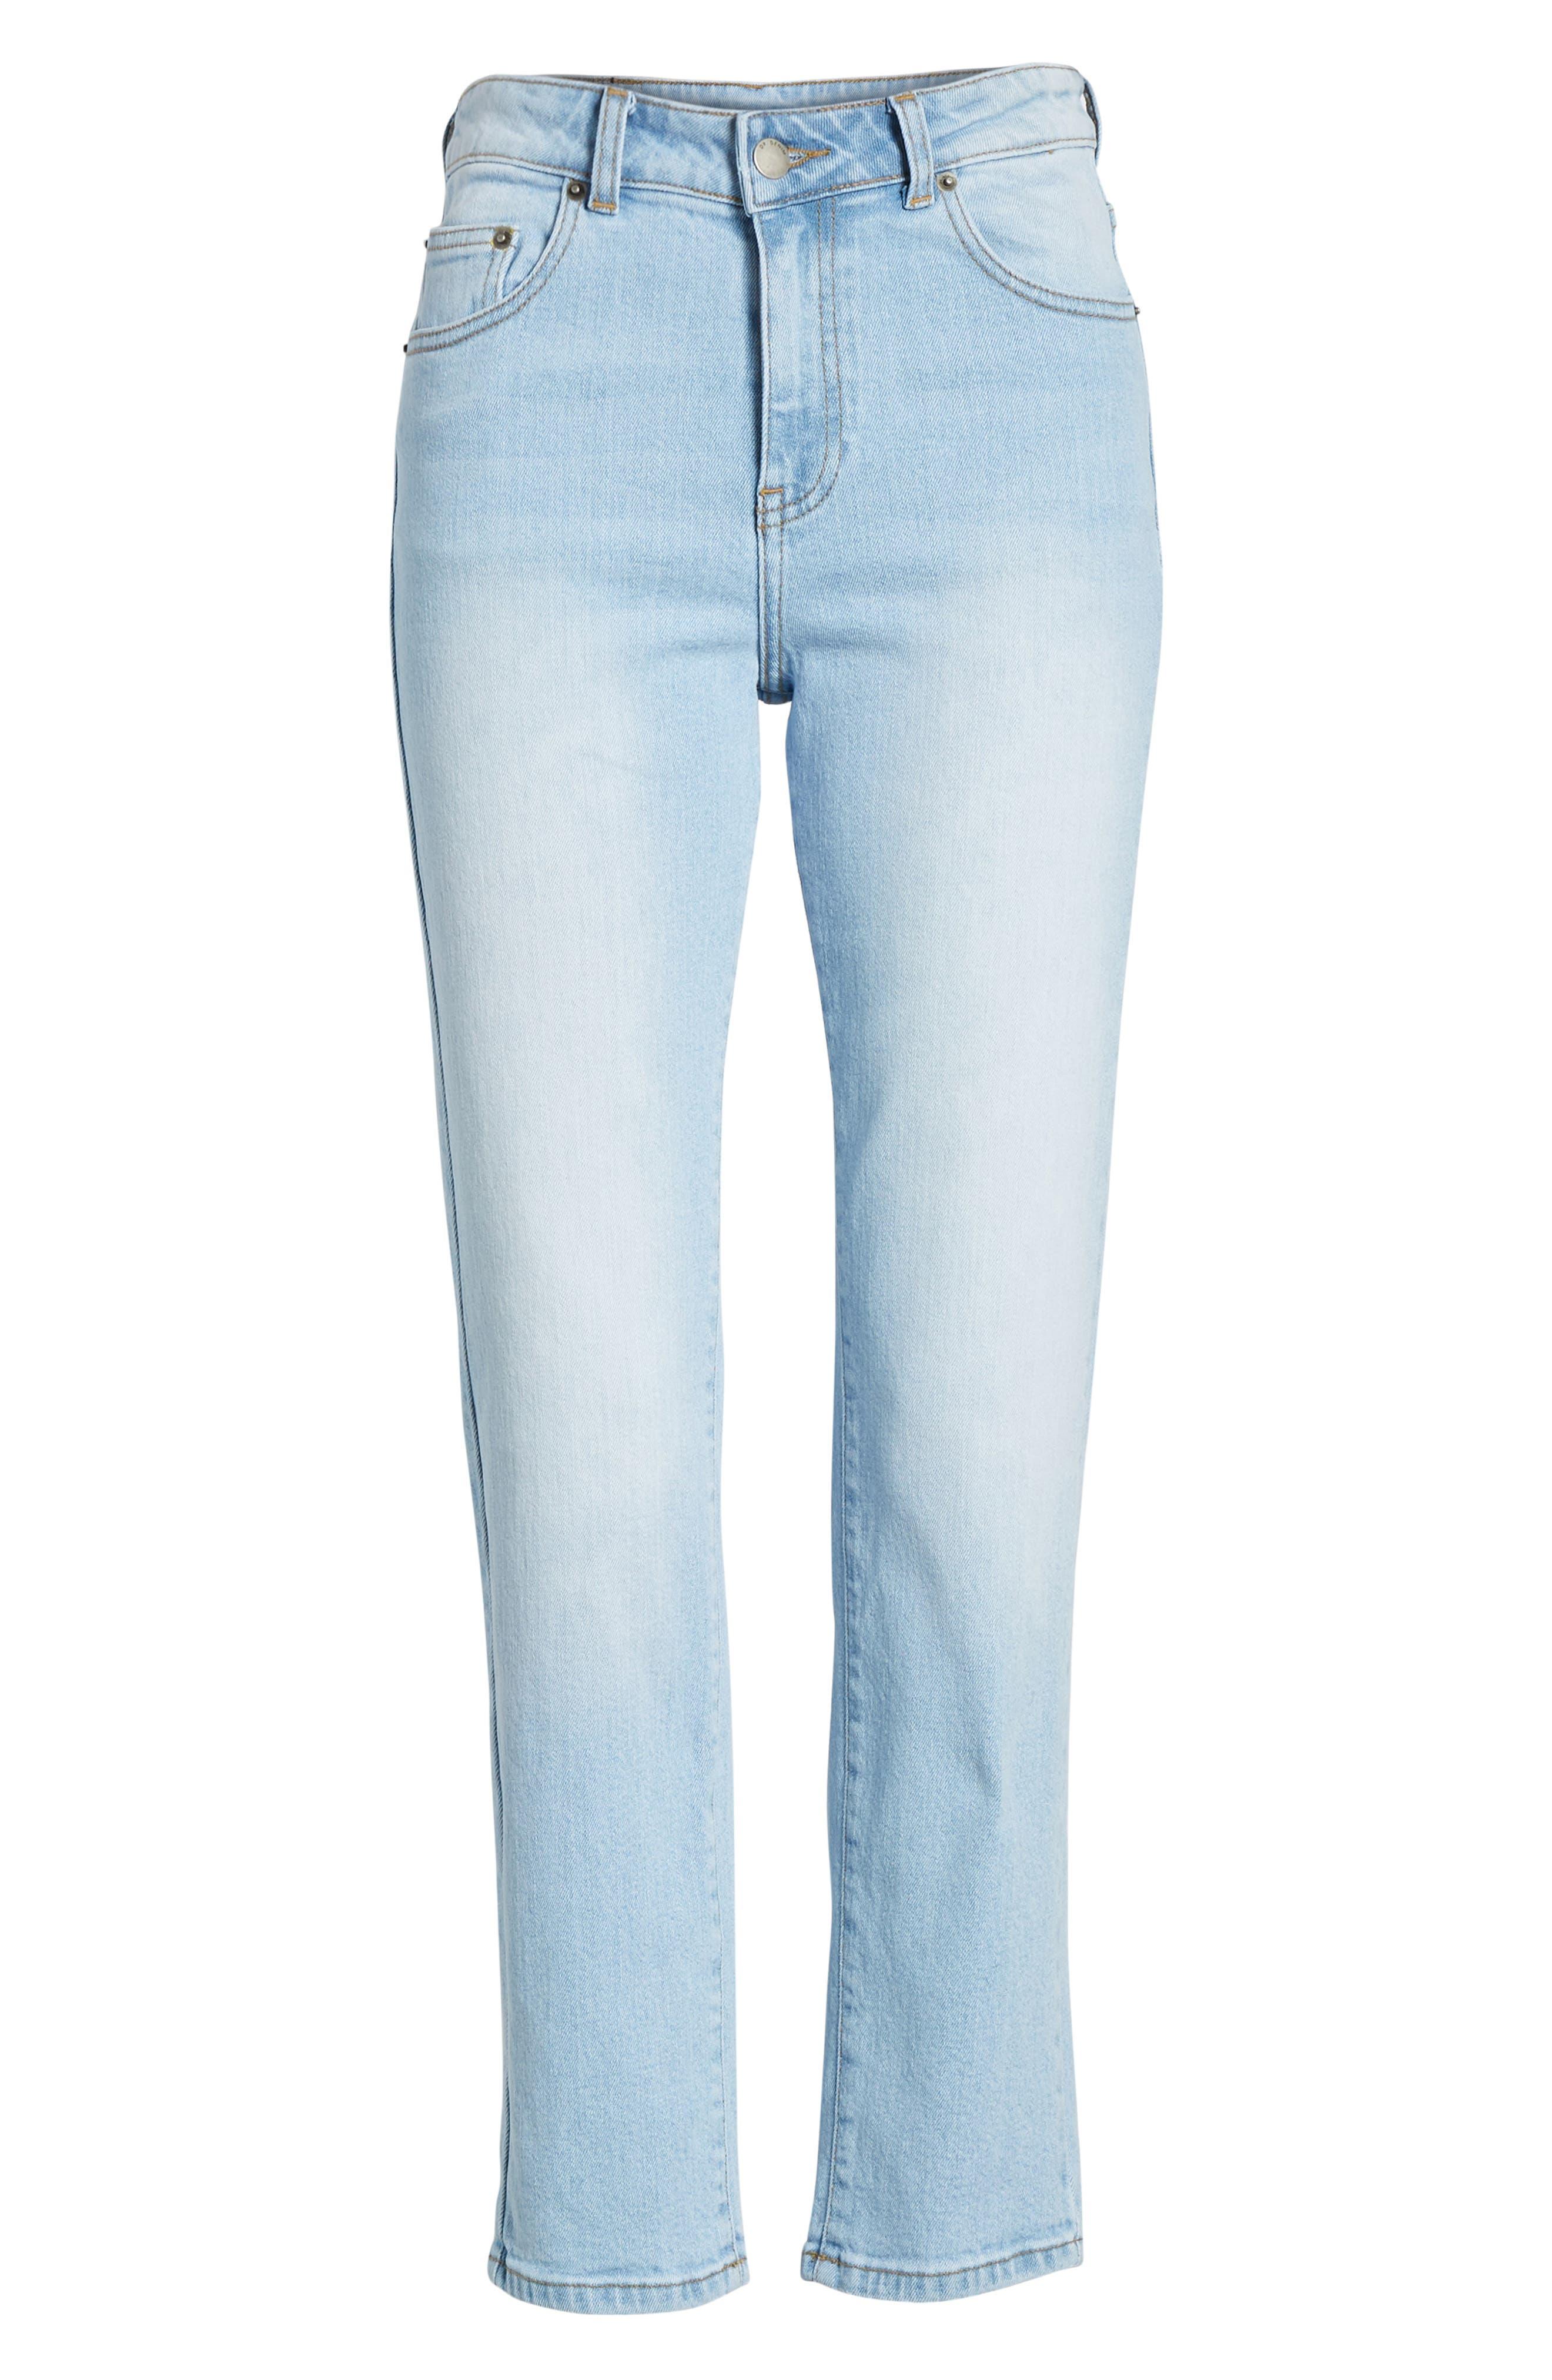 Edie High Waist Crop Straight Leg Jeans,                             Alternate thumbnail 7, color,                             400